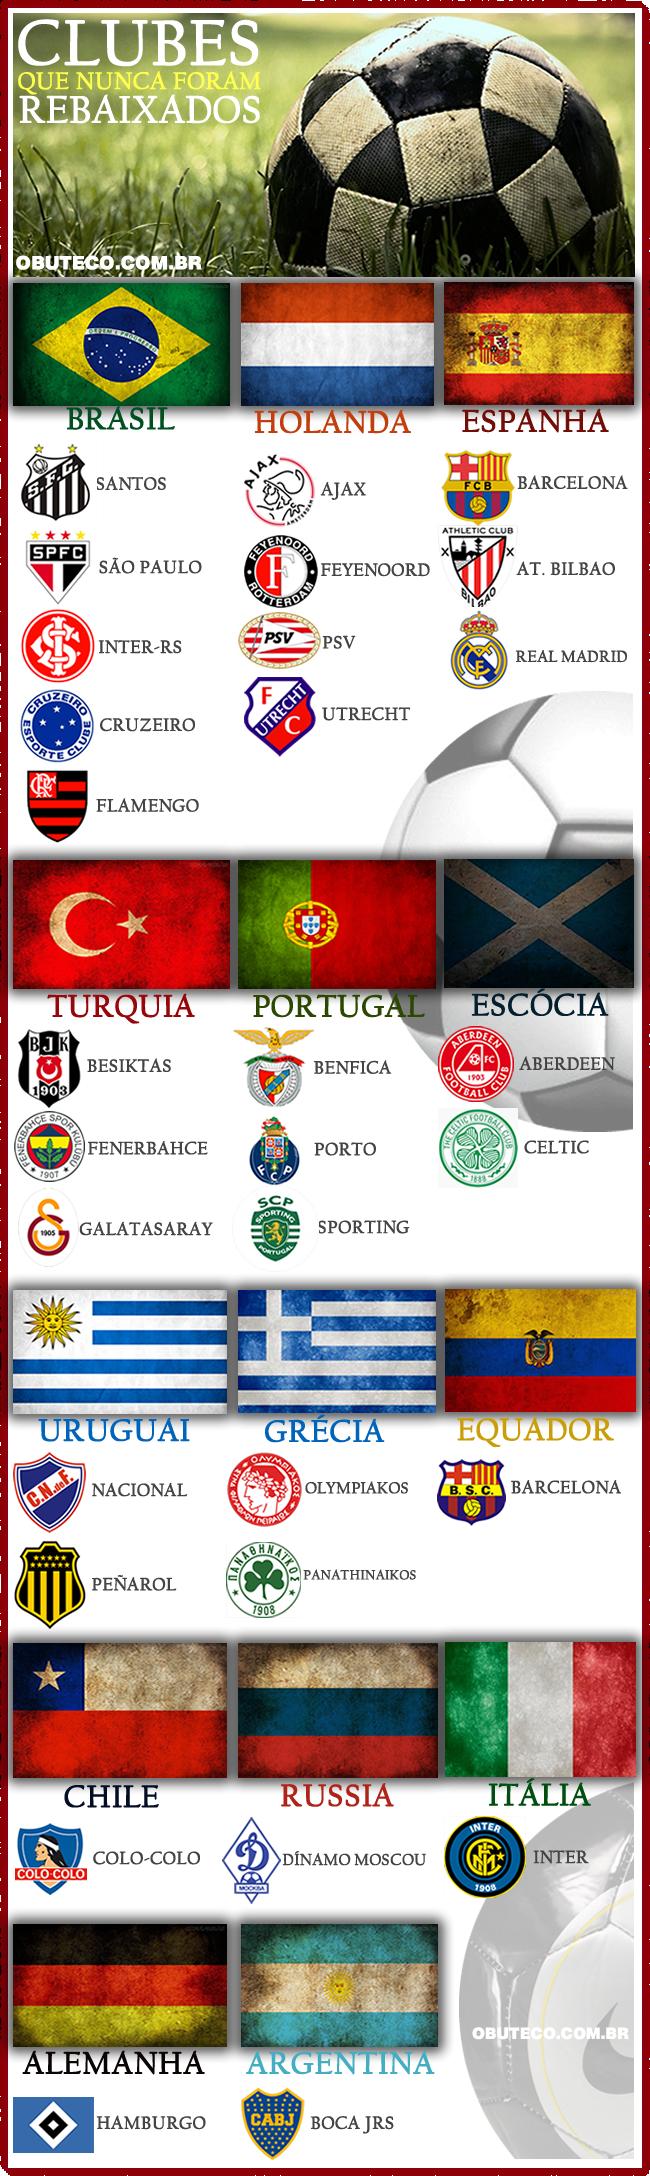 rebaixados_clubes1